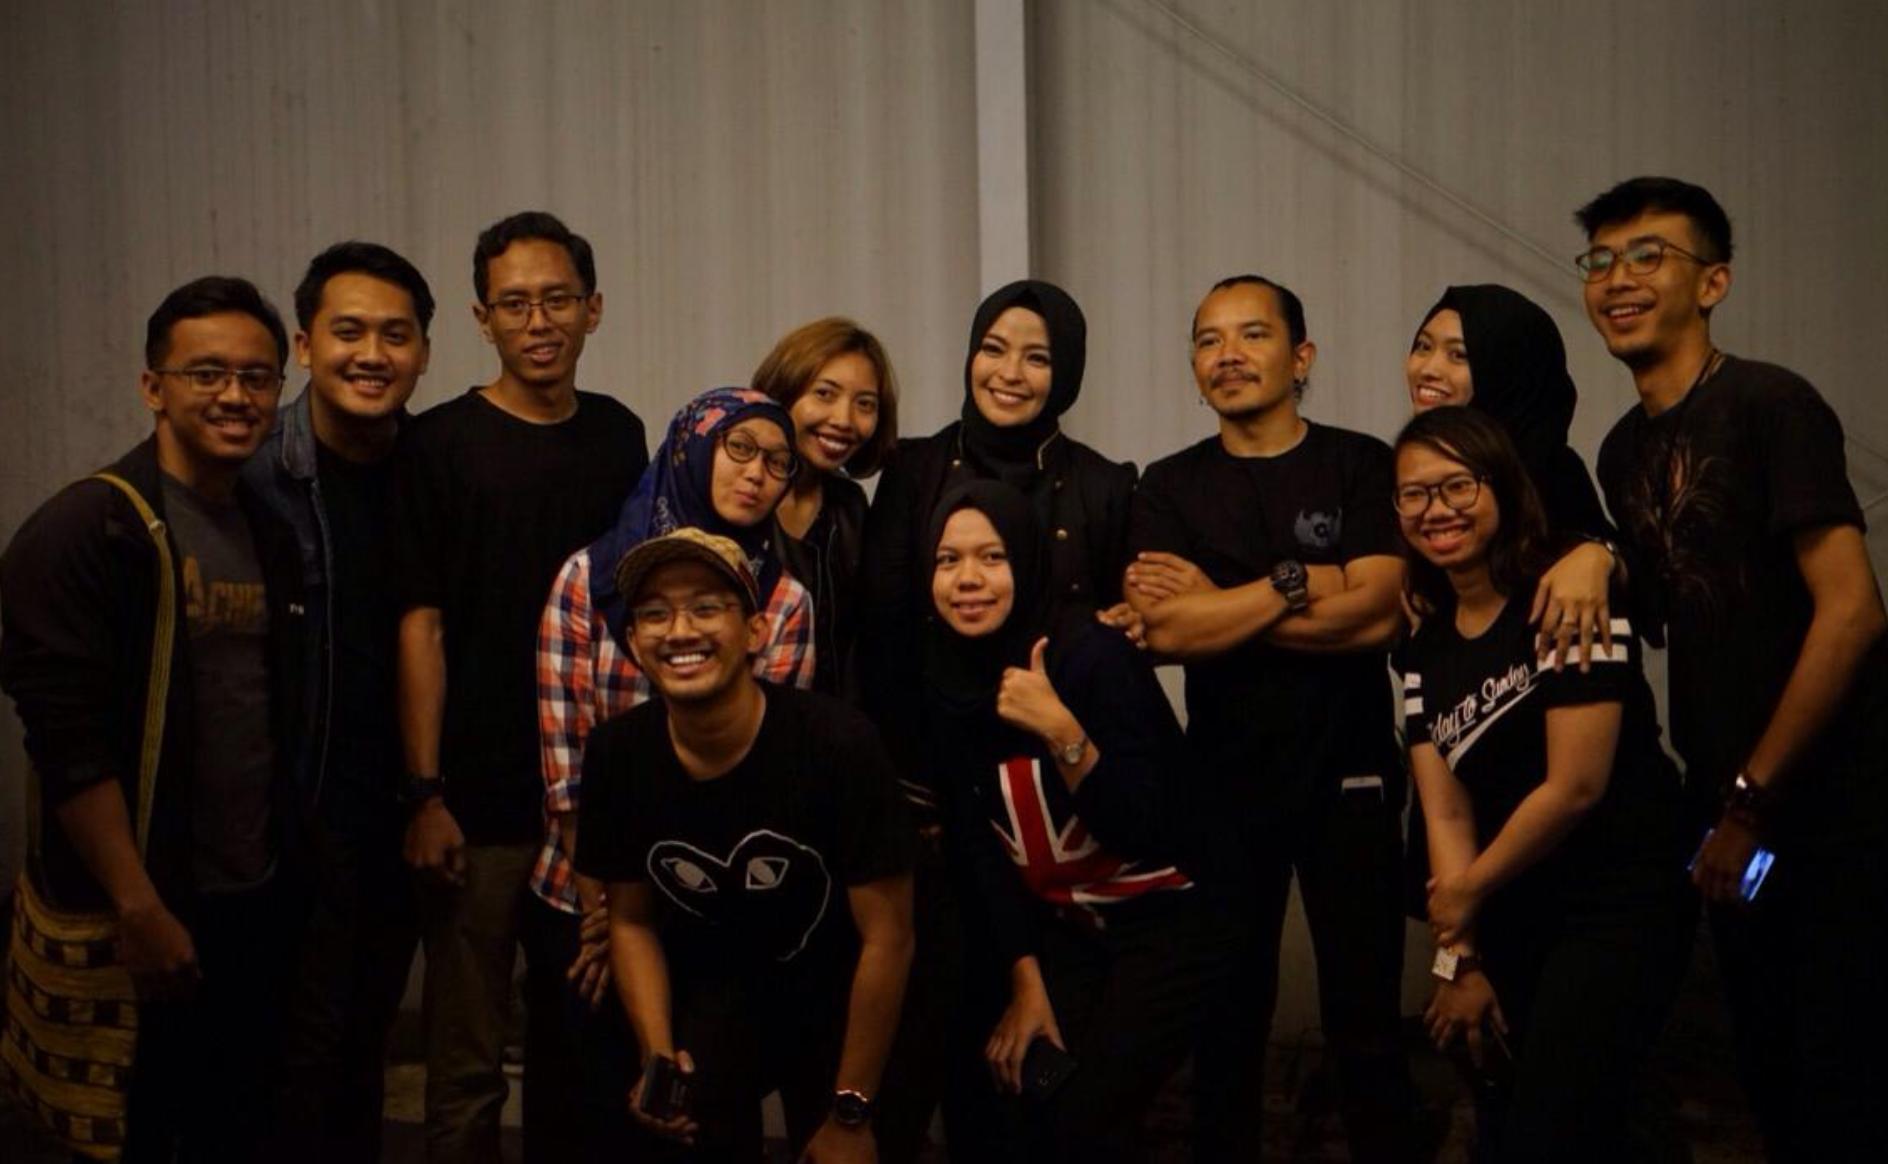 Foto Bareng Kotak Band di Mezzanine Jogja